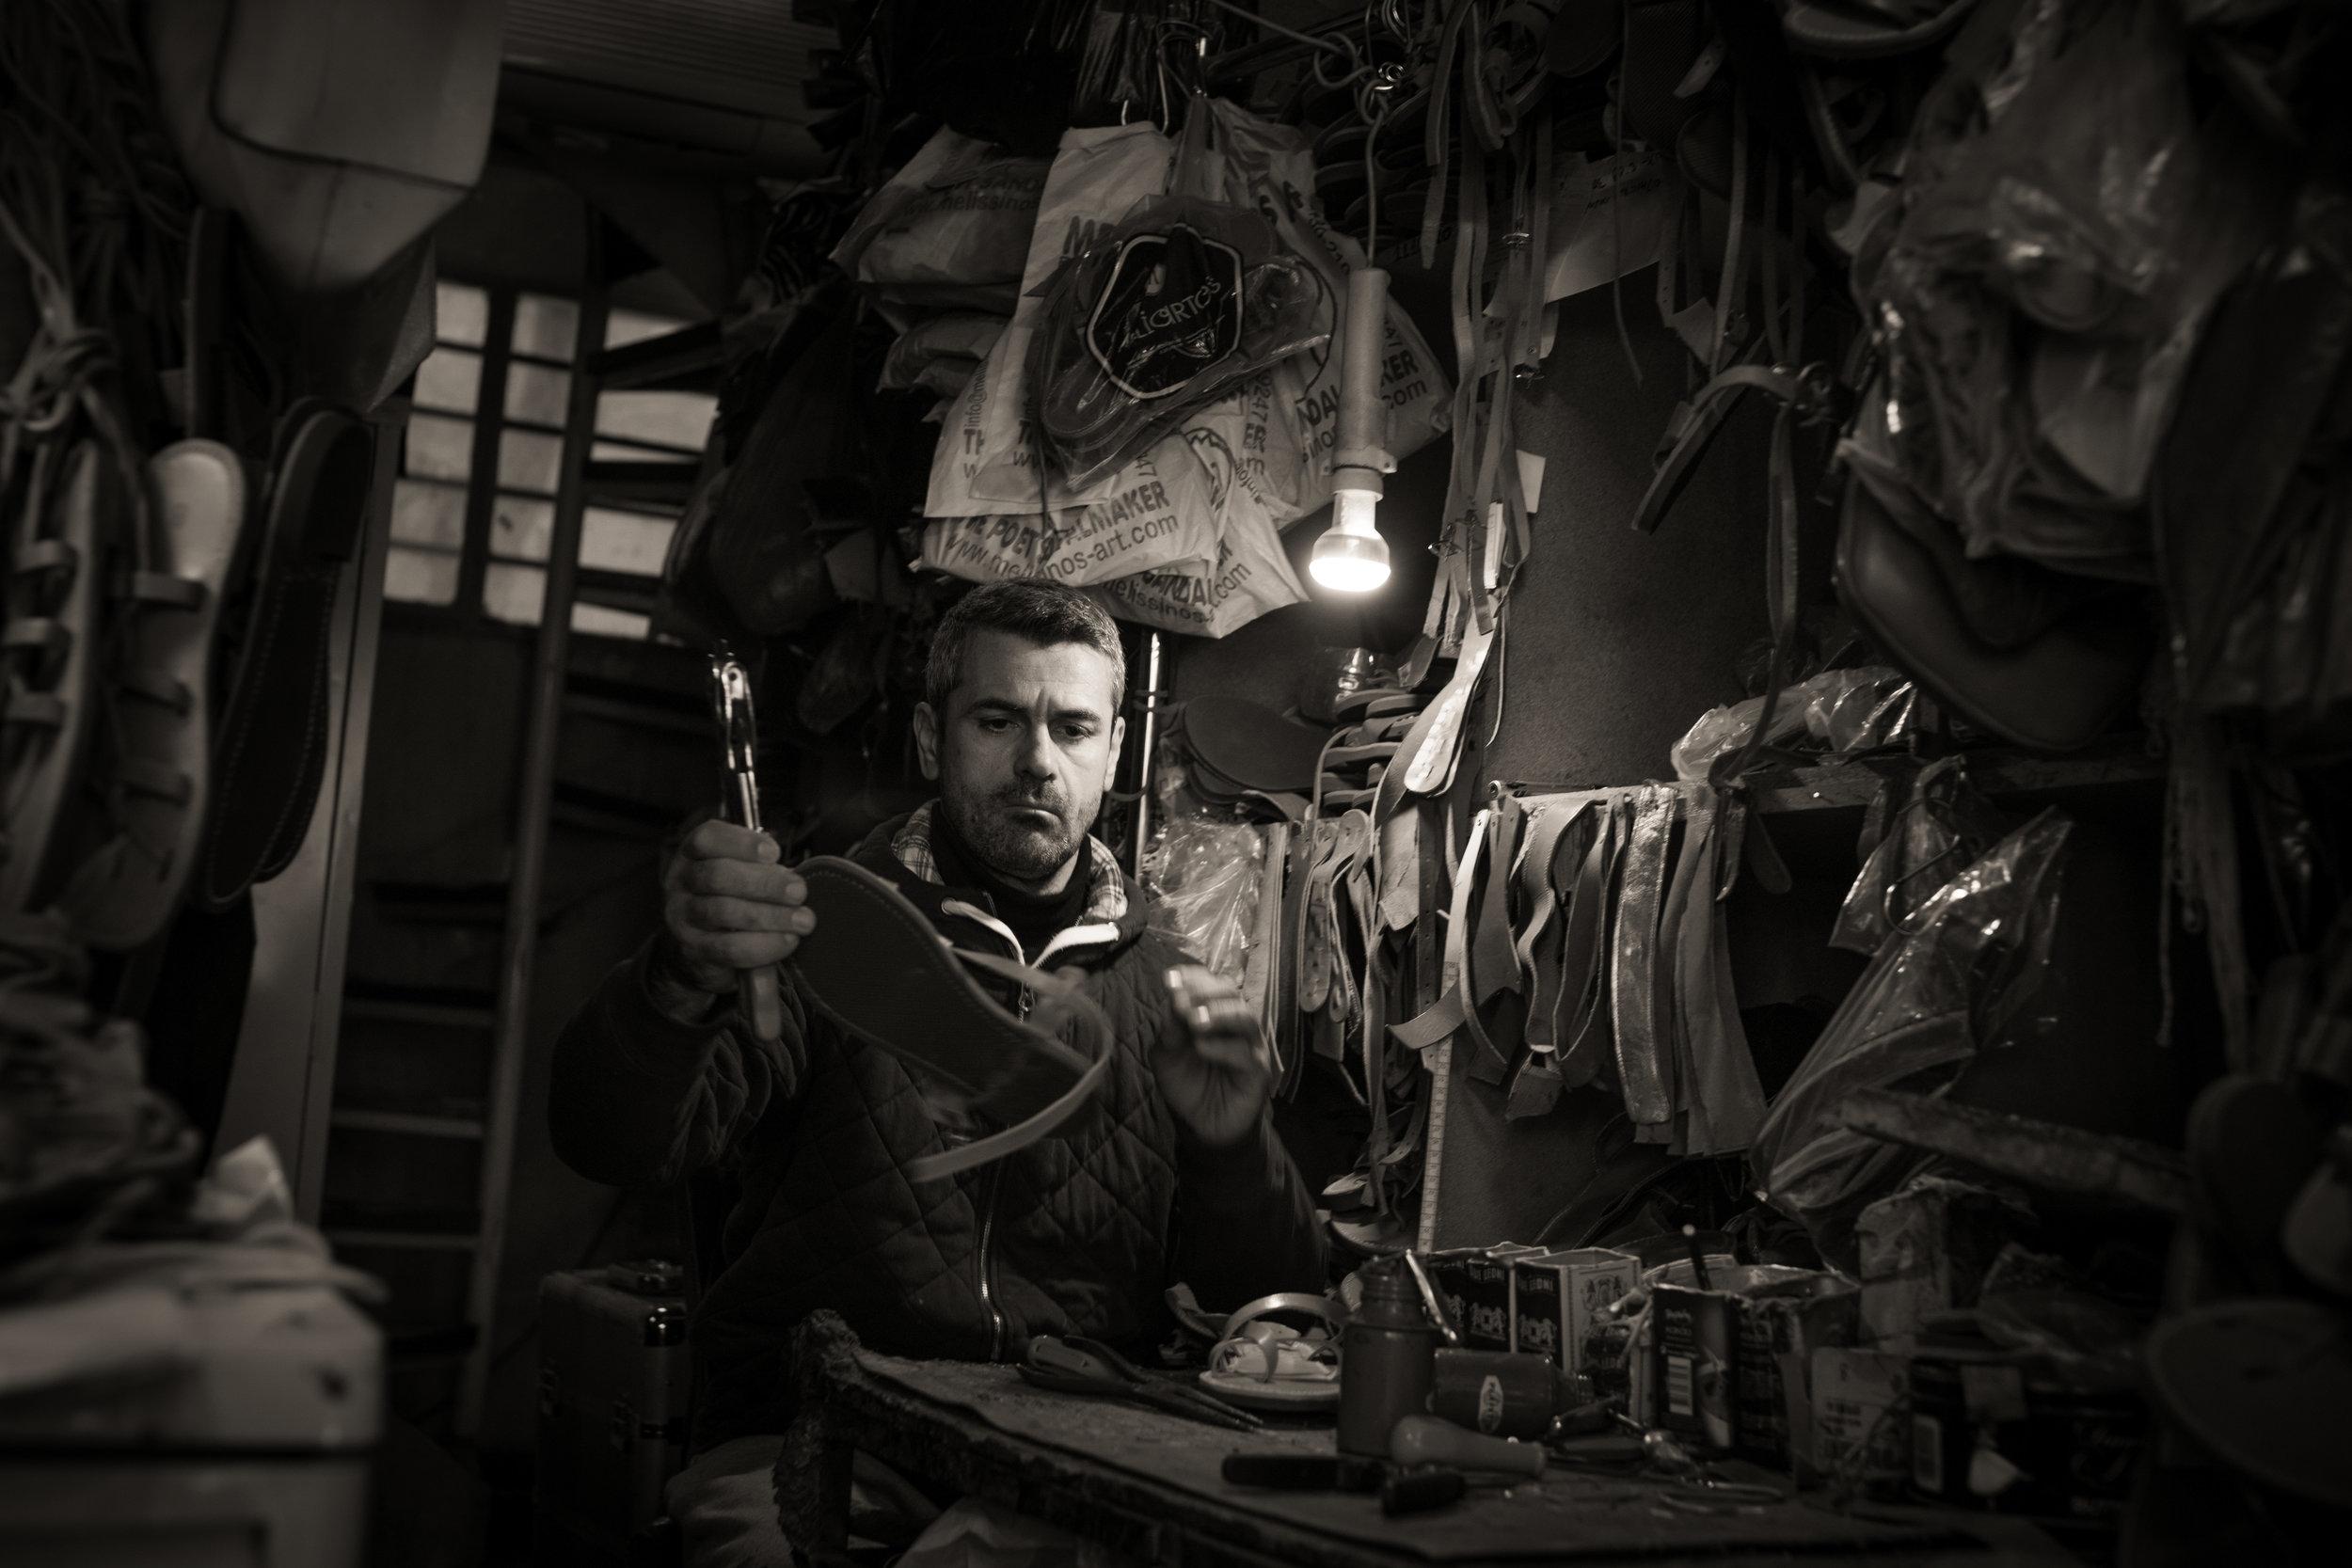 Sandal maker, Athens, Greece. Sony A9, Leica M 35mm f1.4 Summilux.